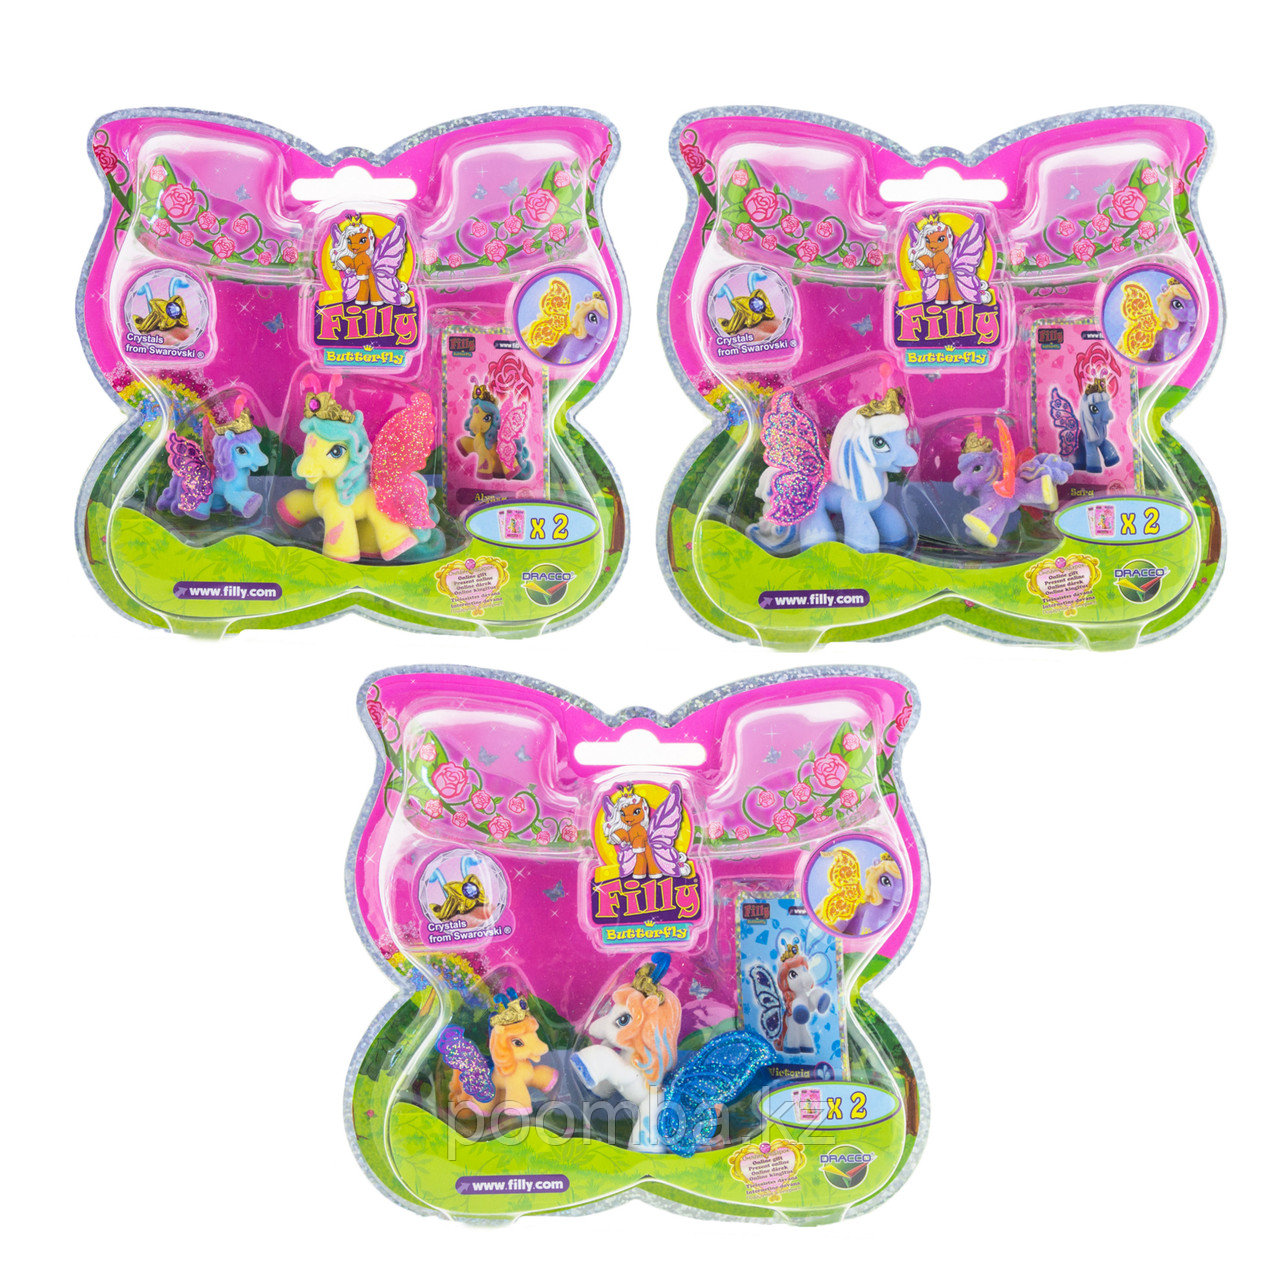 "Малый набор Filly Butterfly Glitter ""Волшебная семья"", 2 фигурки"